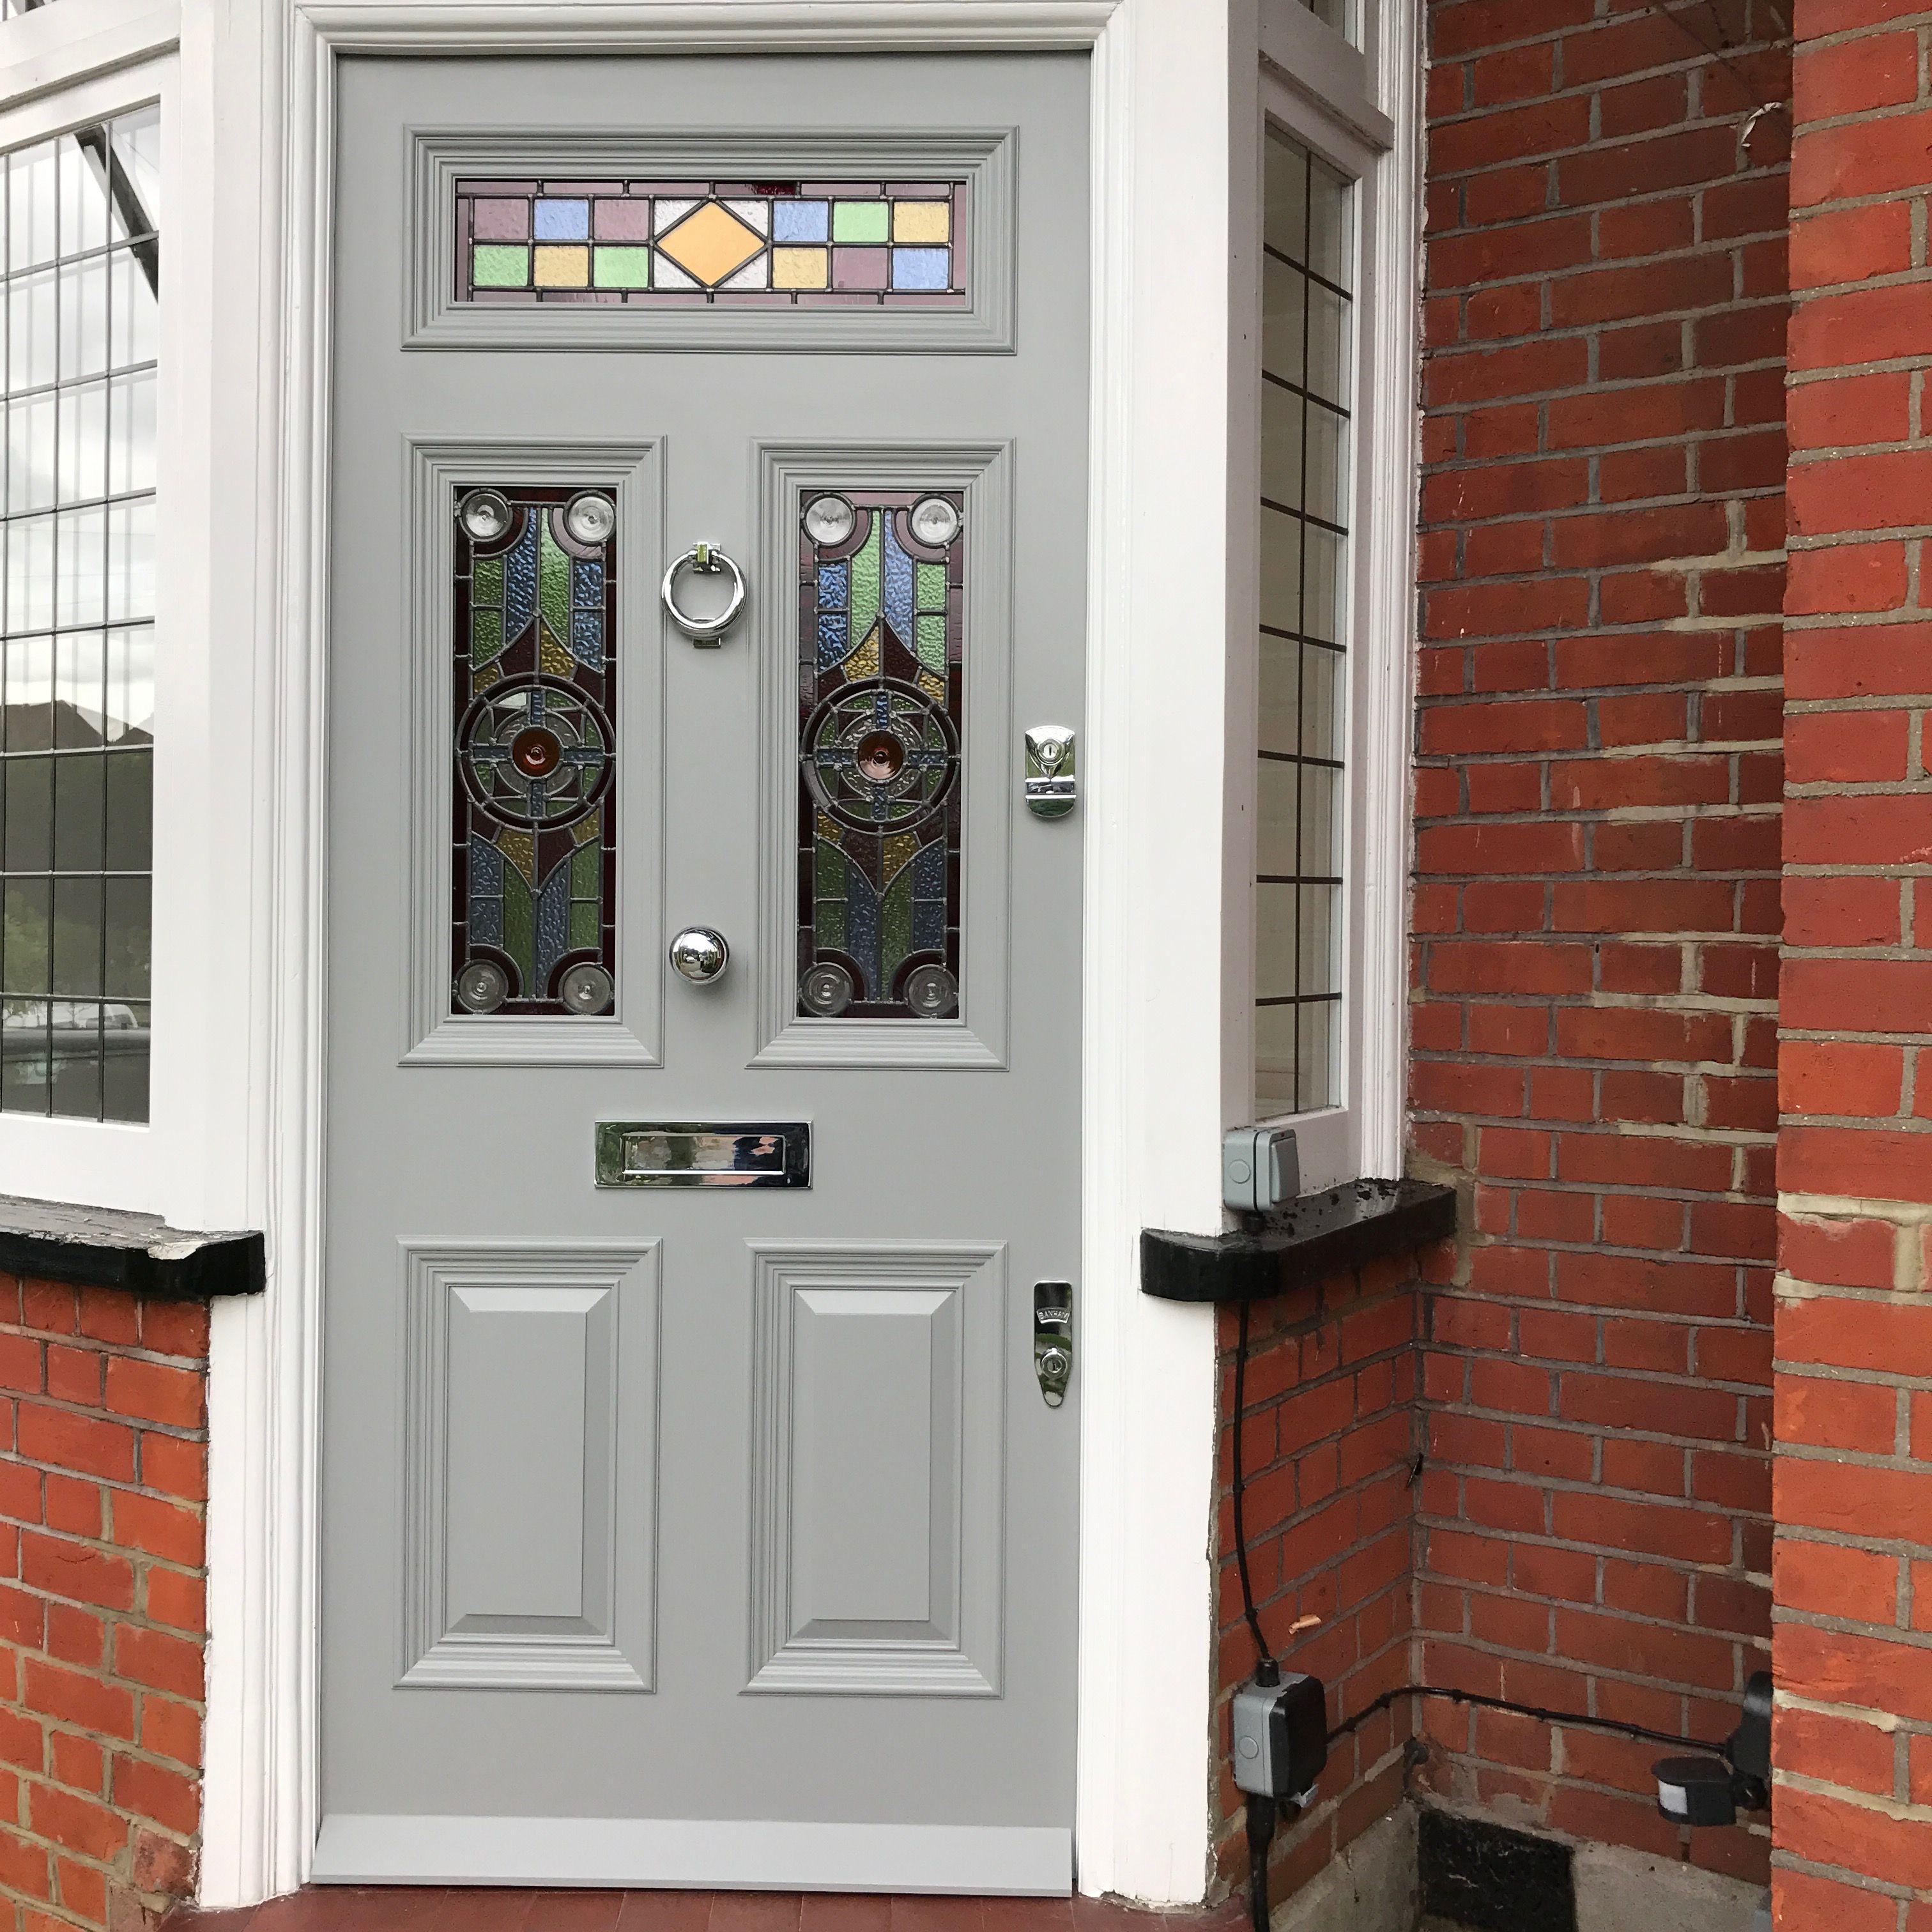 Wonderful period front door recently installed in London & Wonderful period front door recently installed in London   London ... pezcame.com